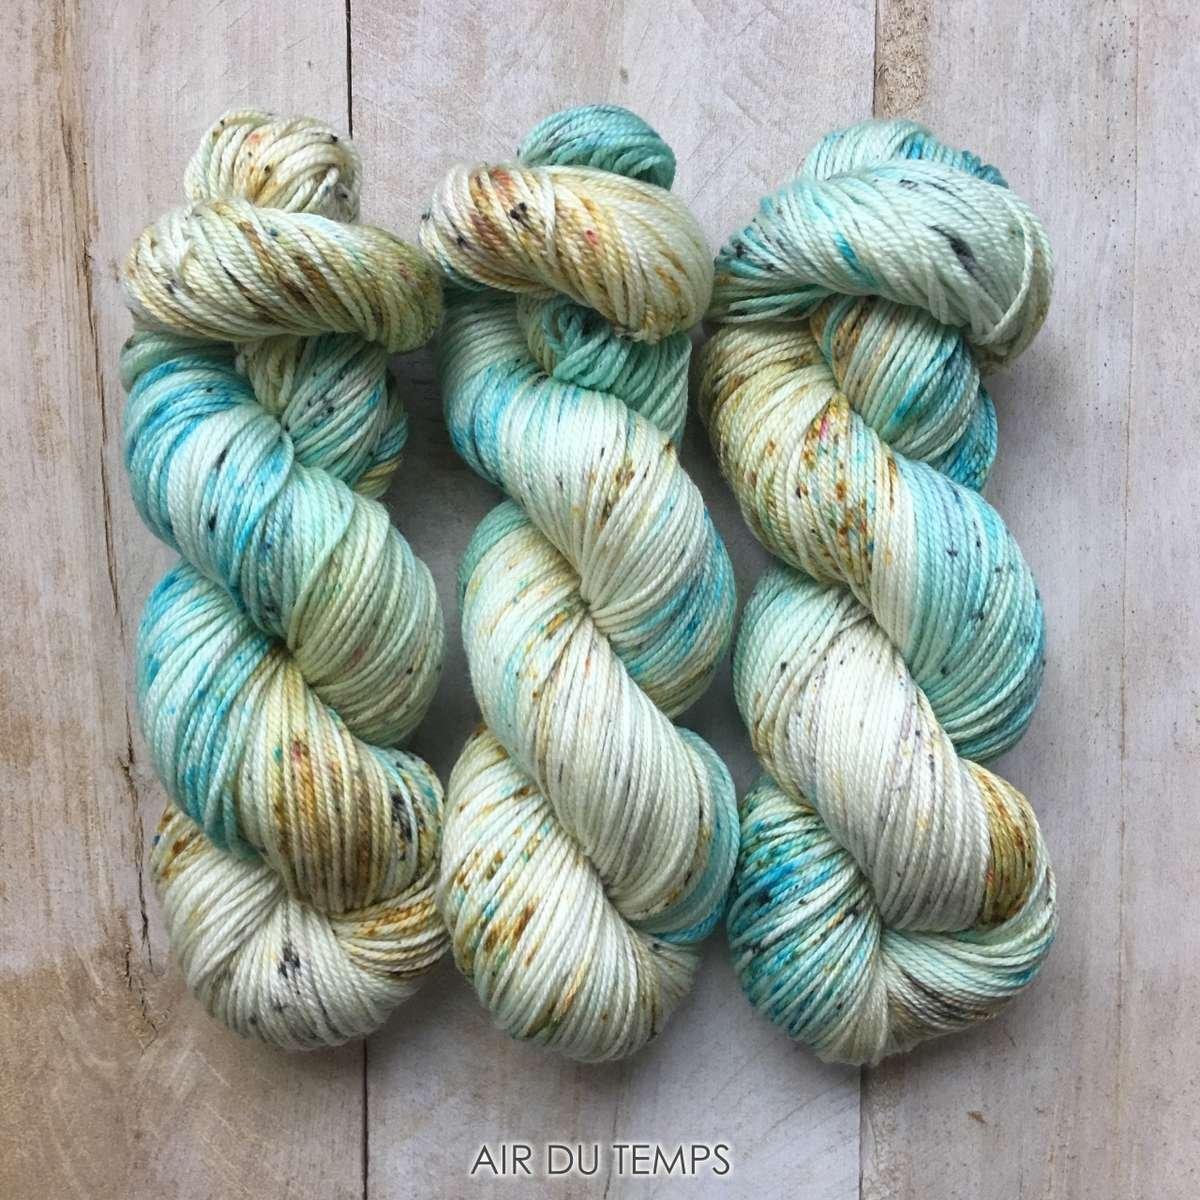 Hand-dyed yarn Louise Robert Air du temps